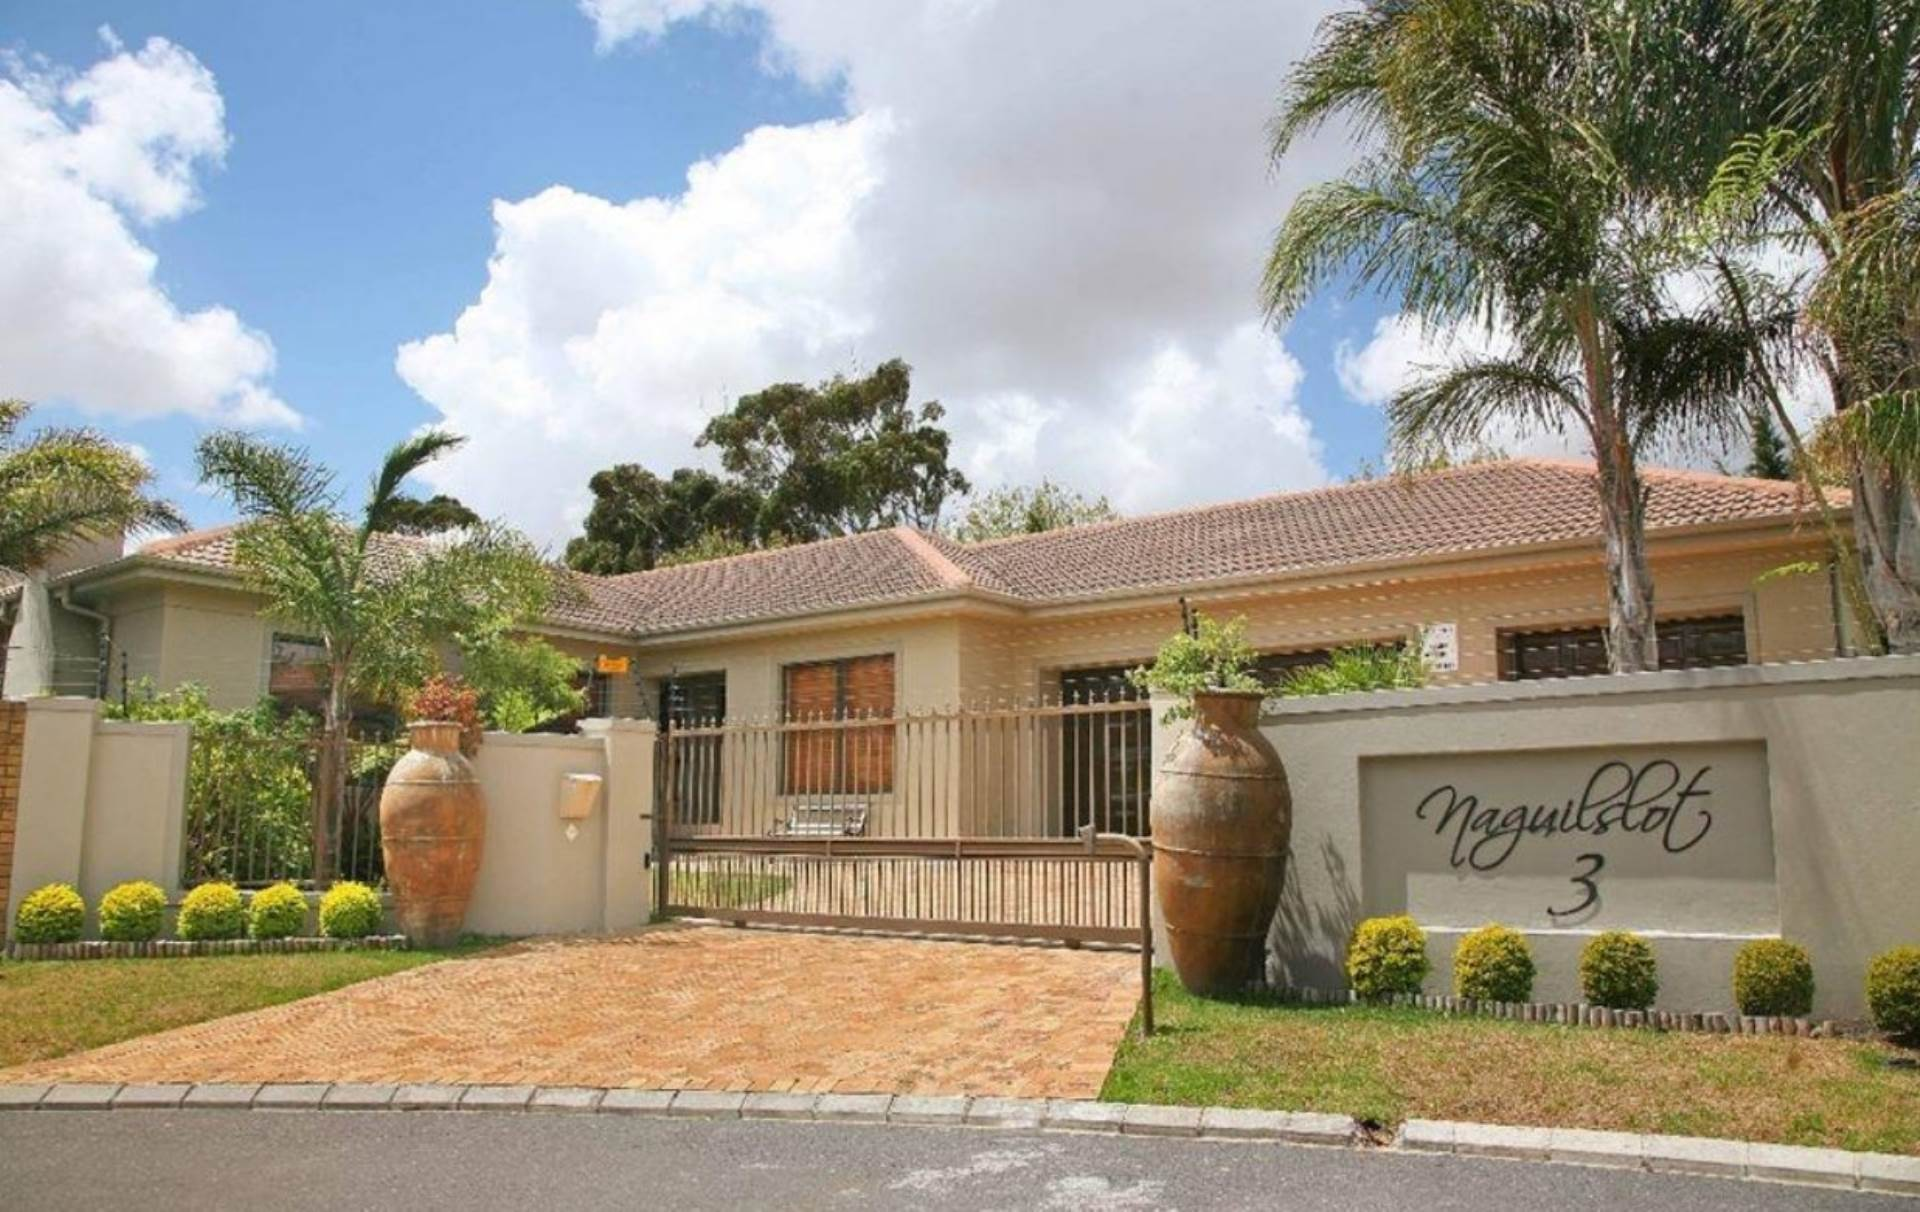 4 BedroomHouse To Rent In D'urbanvale